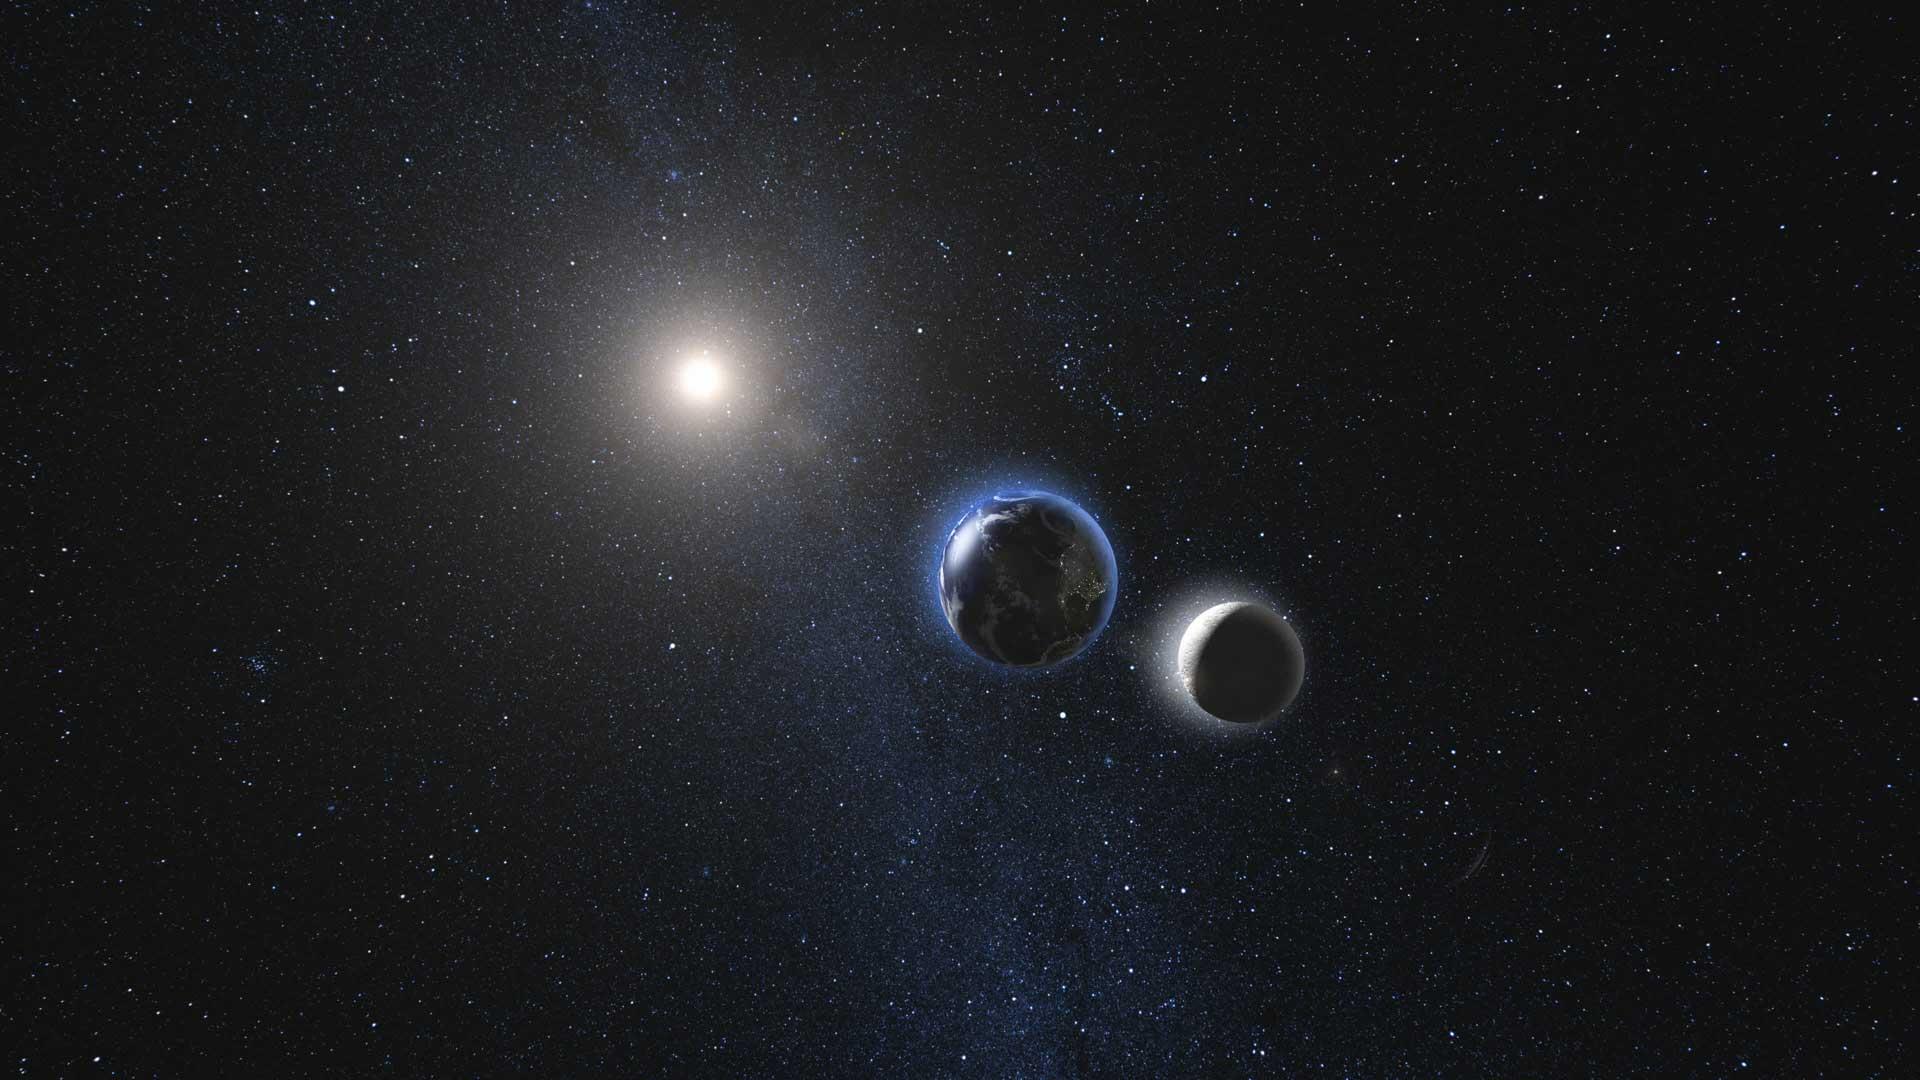 Moon Light Energy Rotating Approach